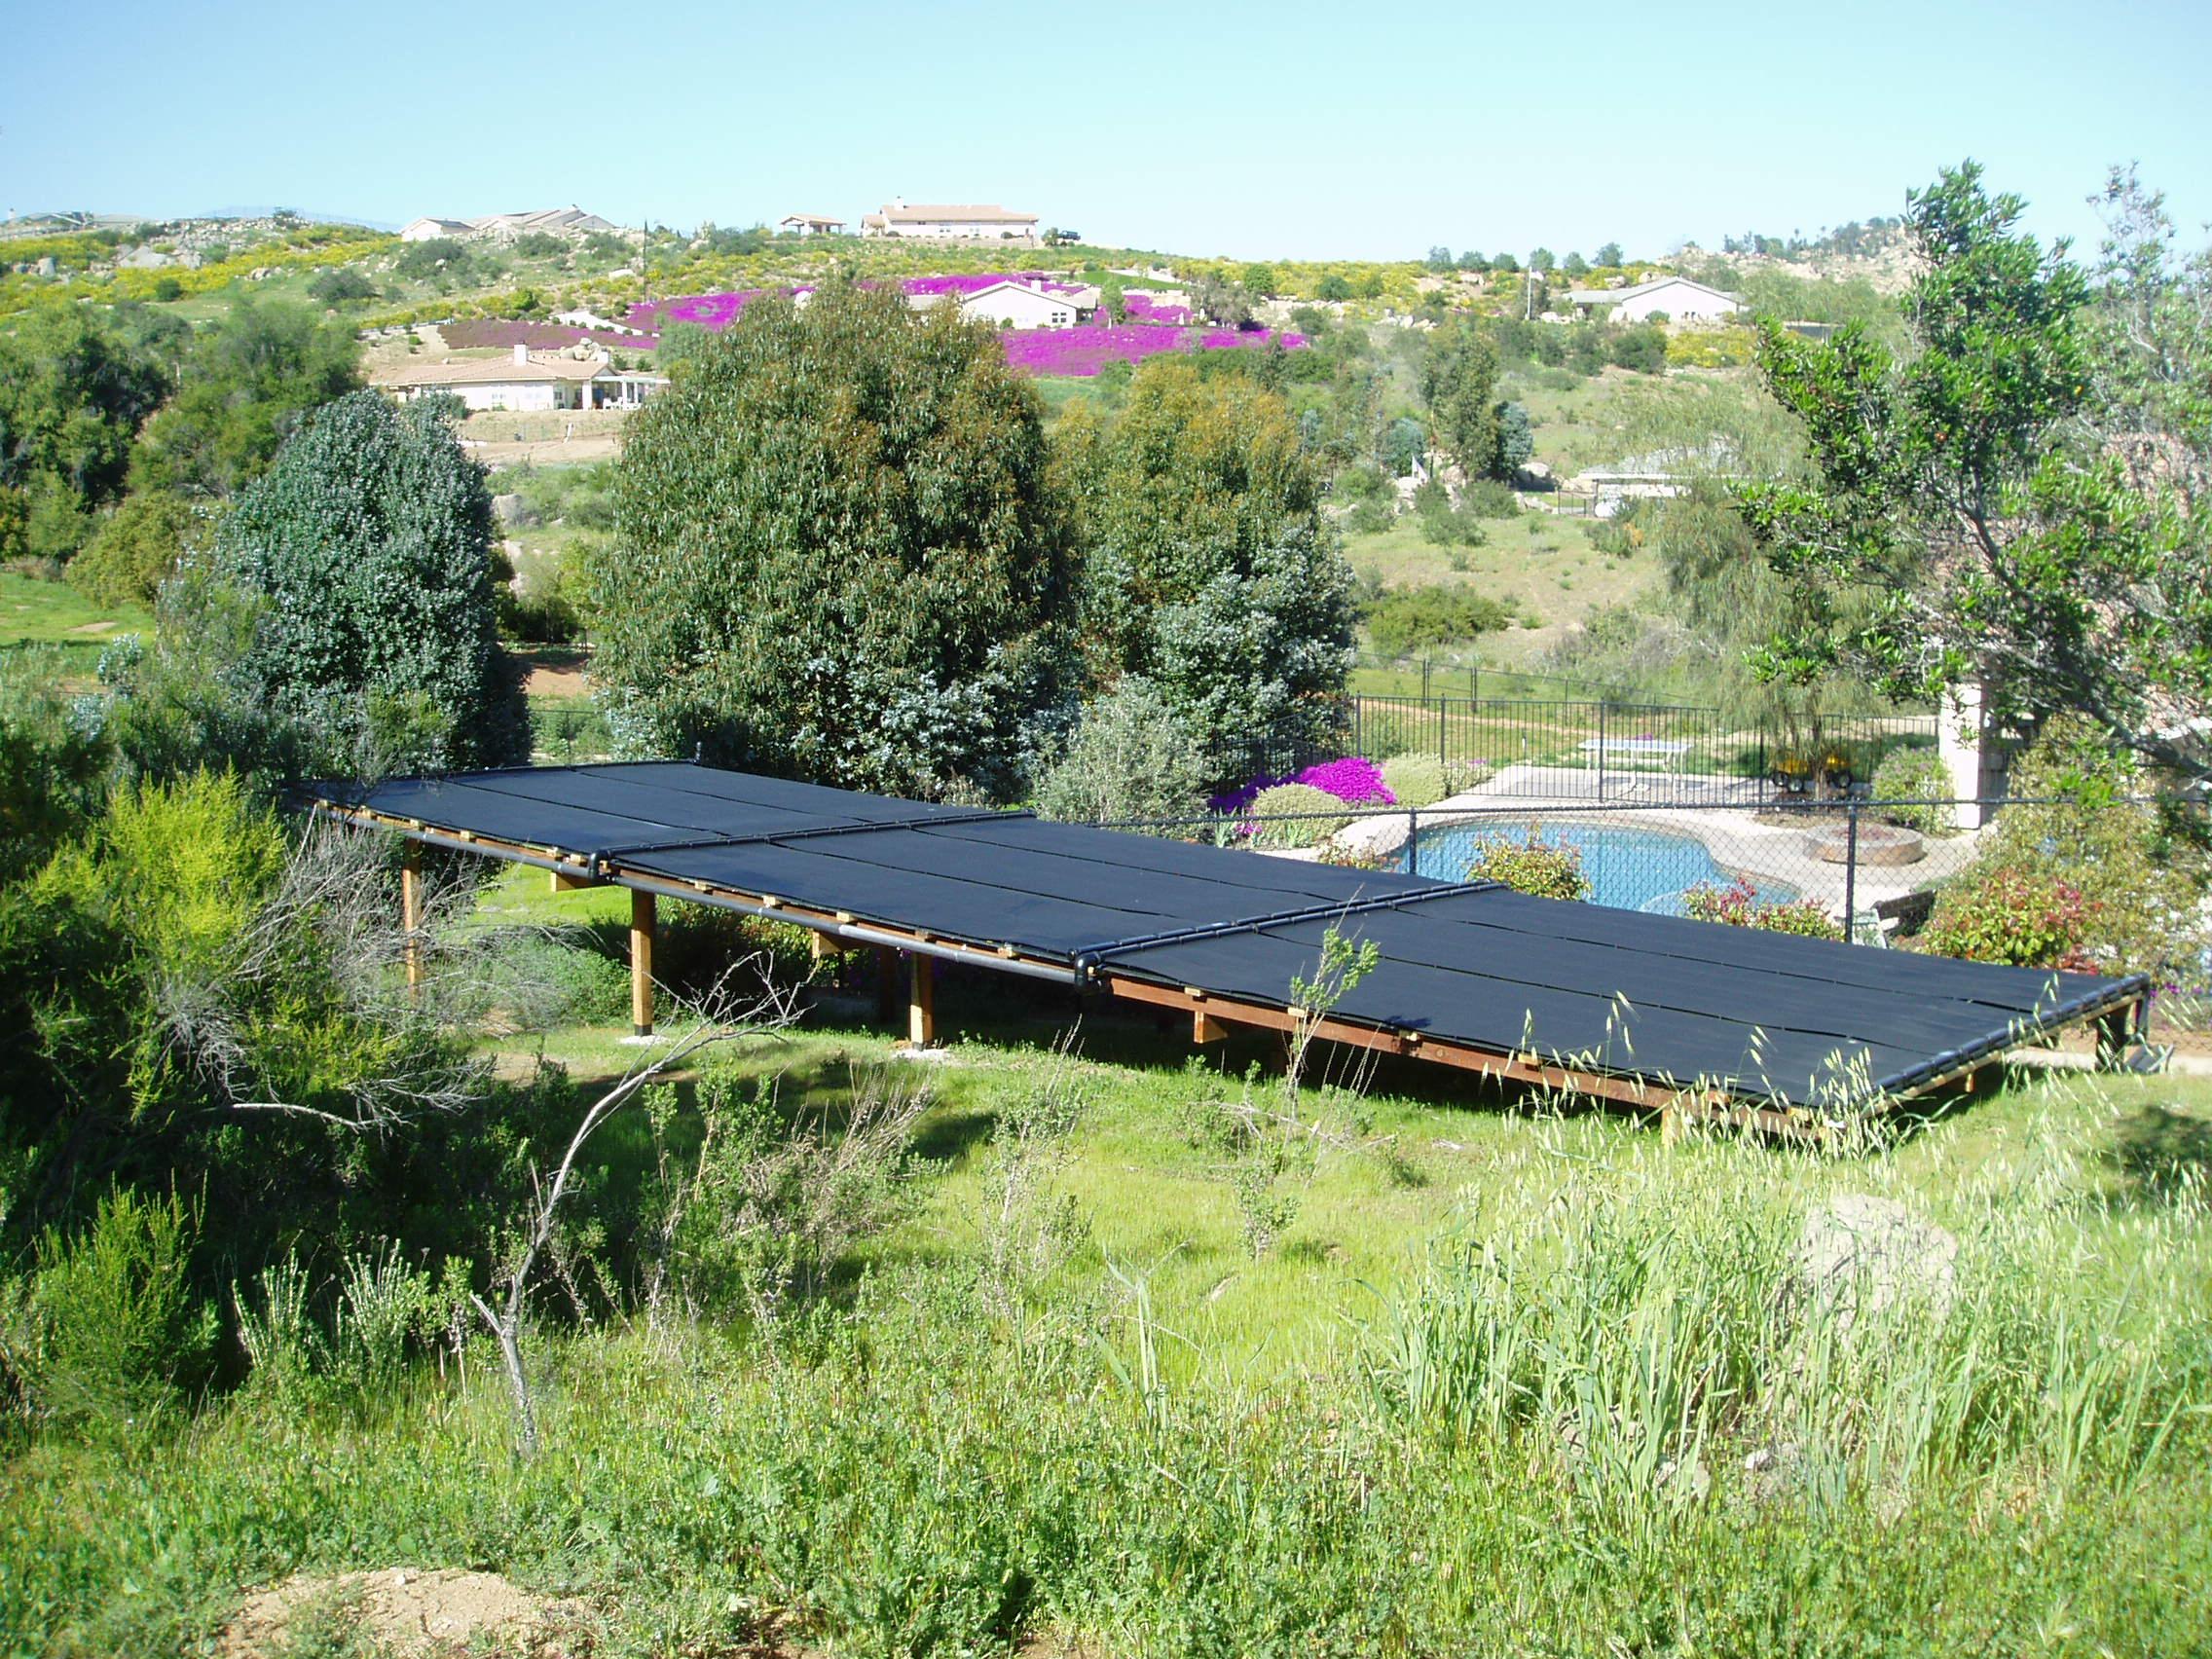 san-luis-solar-san-luis-obispo-solar-pool-heating